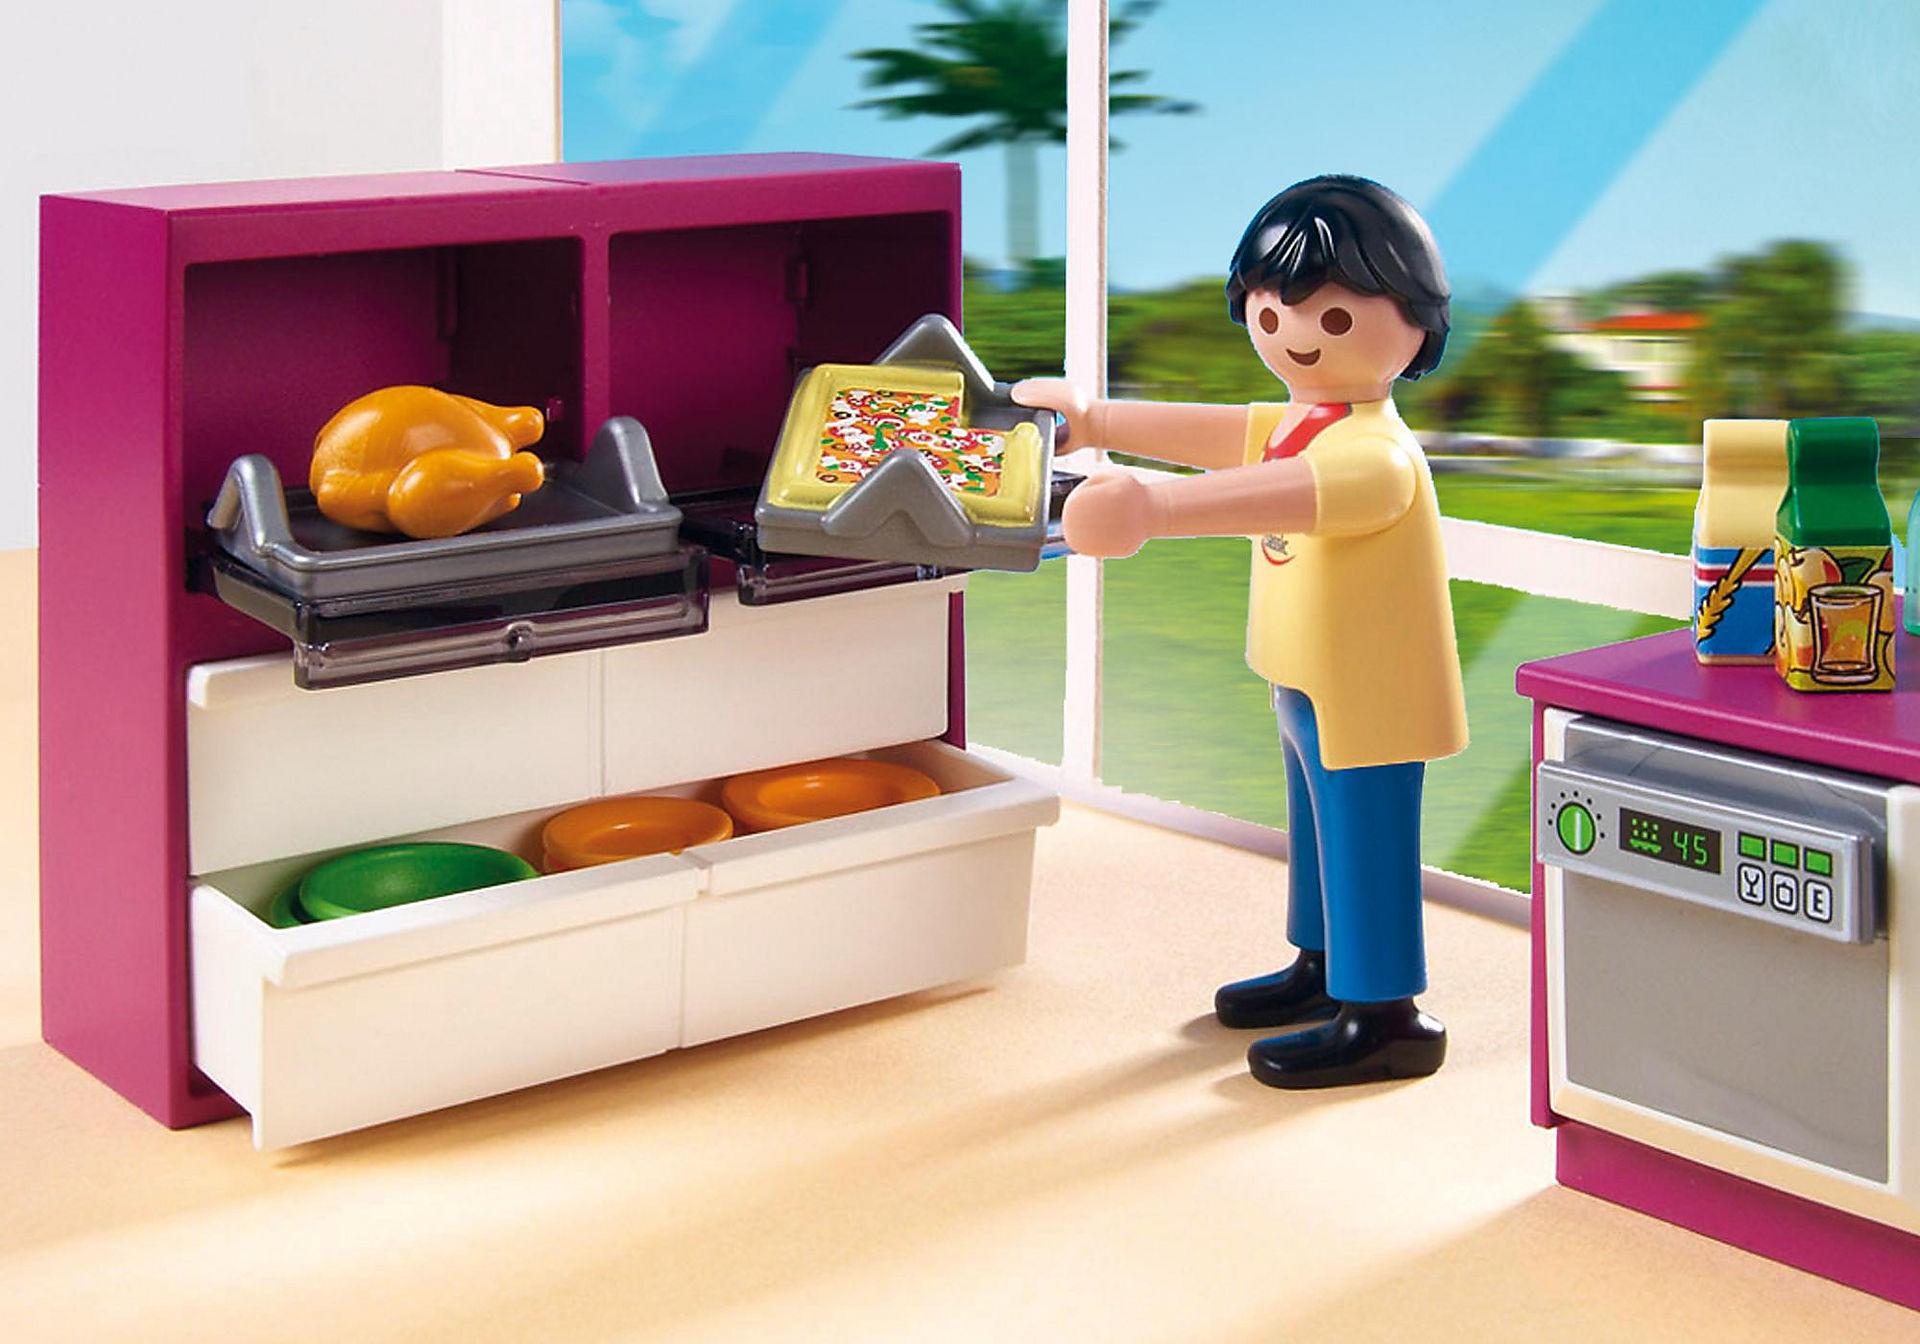 http://media.playmobil.com/i/playmobil/5582_product_extra3/Cucina con isola attrezzata